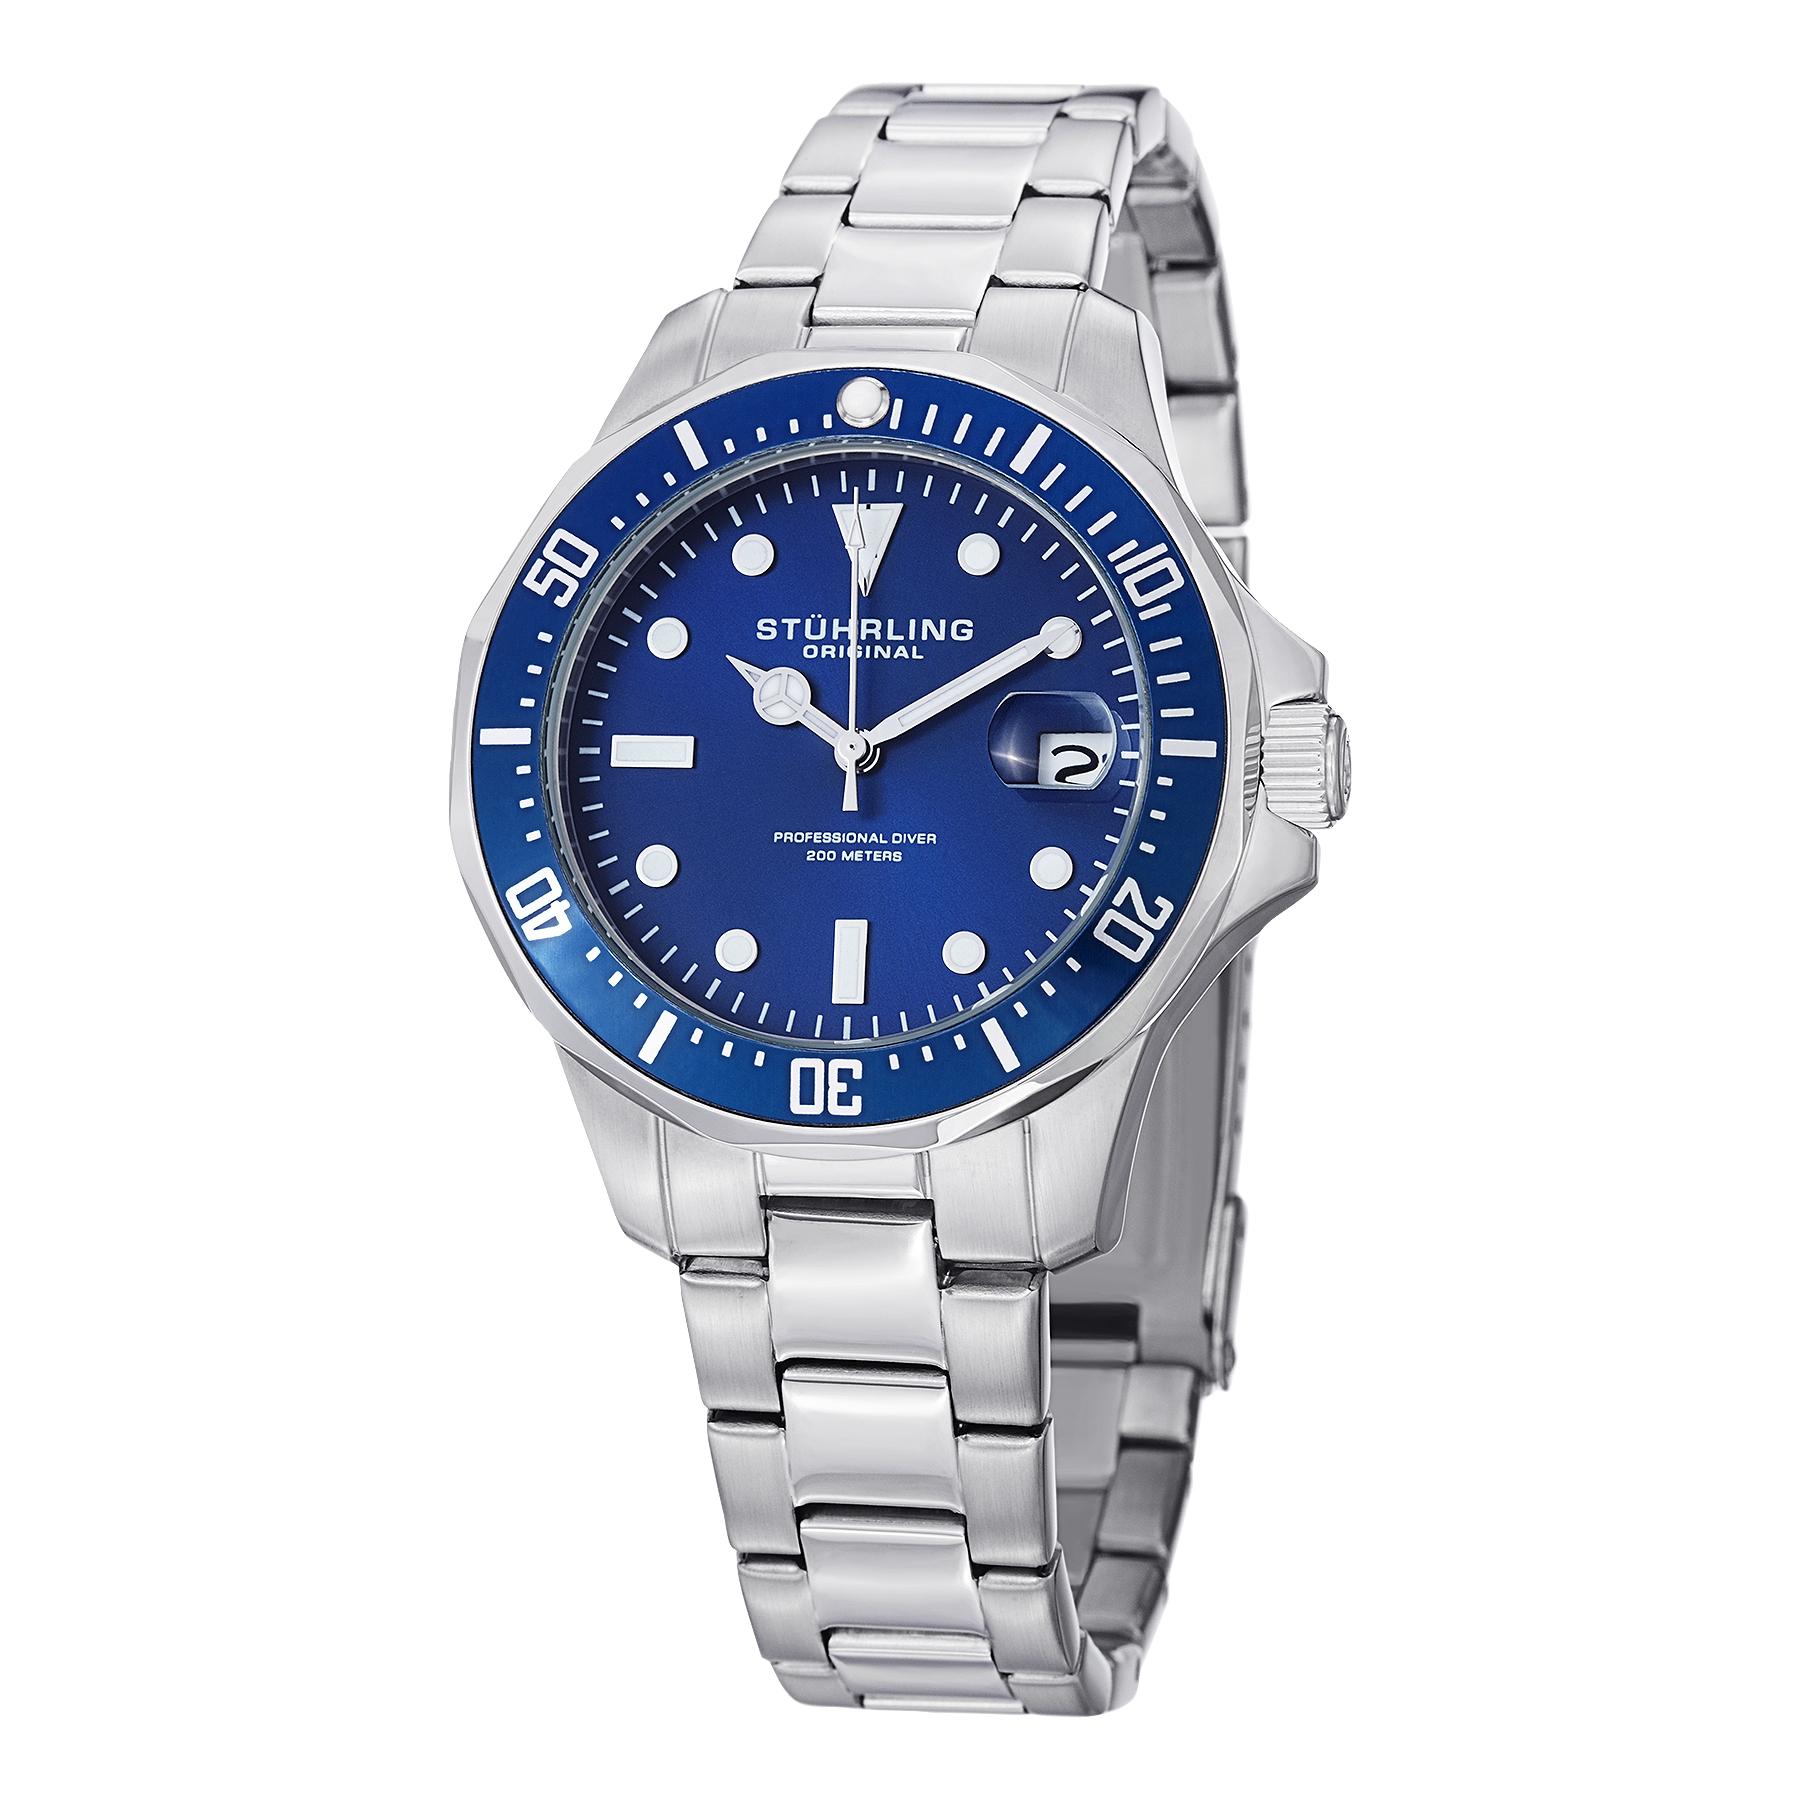 Stuhrling Original Aquadiver Mens Dive Watch Quartz Analog Waterproof Sports Watch Blue Dial Date Display Swim Wrist... by Stuhrling Original